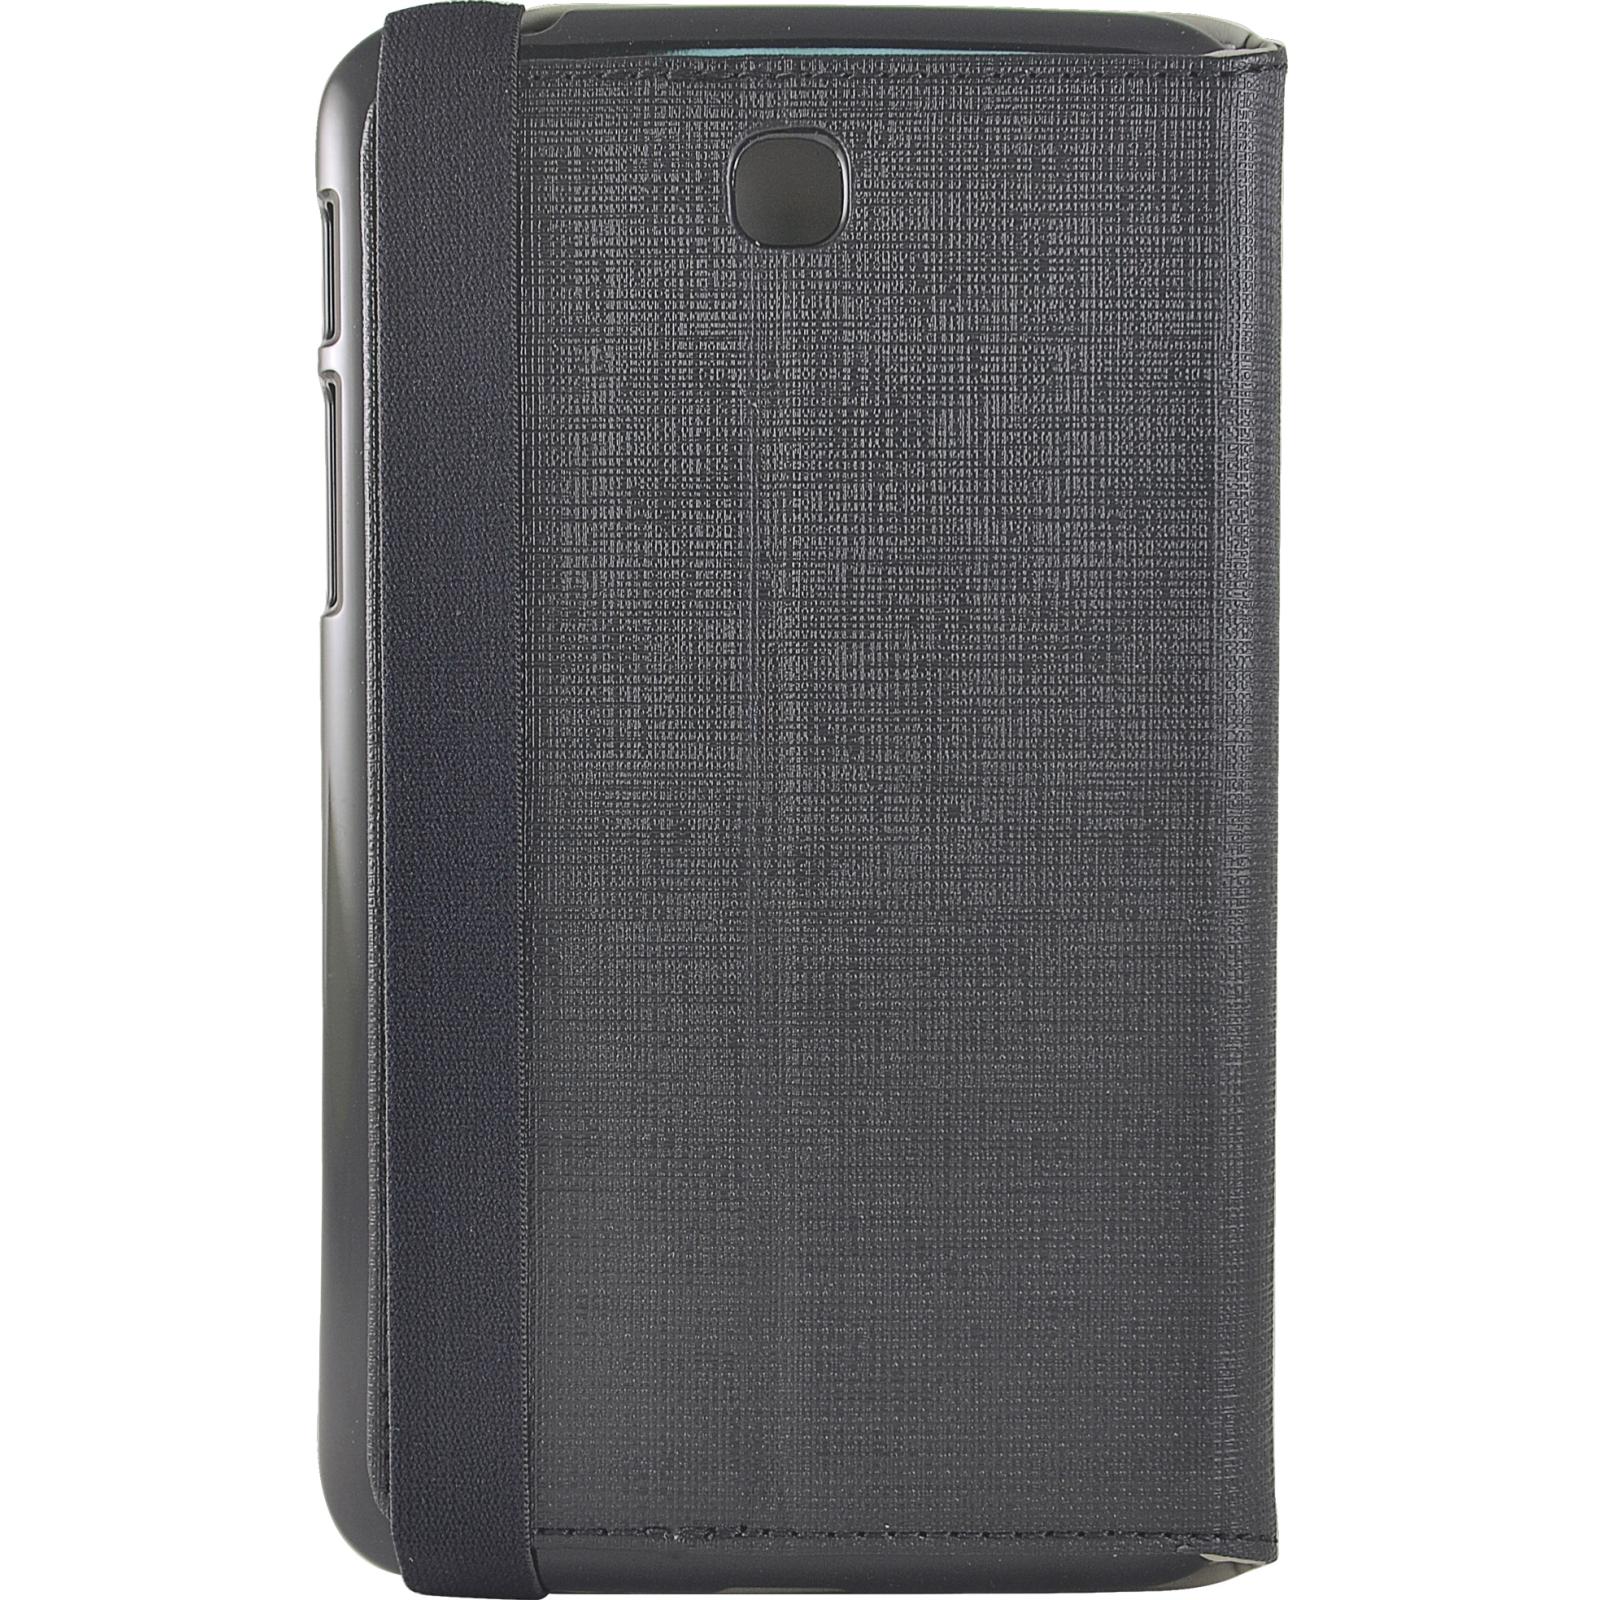 "Чехол для планшета Rock 7"" Samsung Galaxy Tab 3 7.0 T2100/T2110 Flexible Series (32006 black) изображение 2"